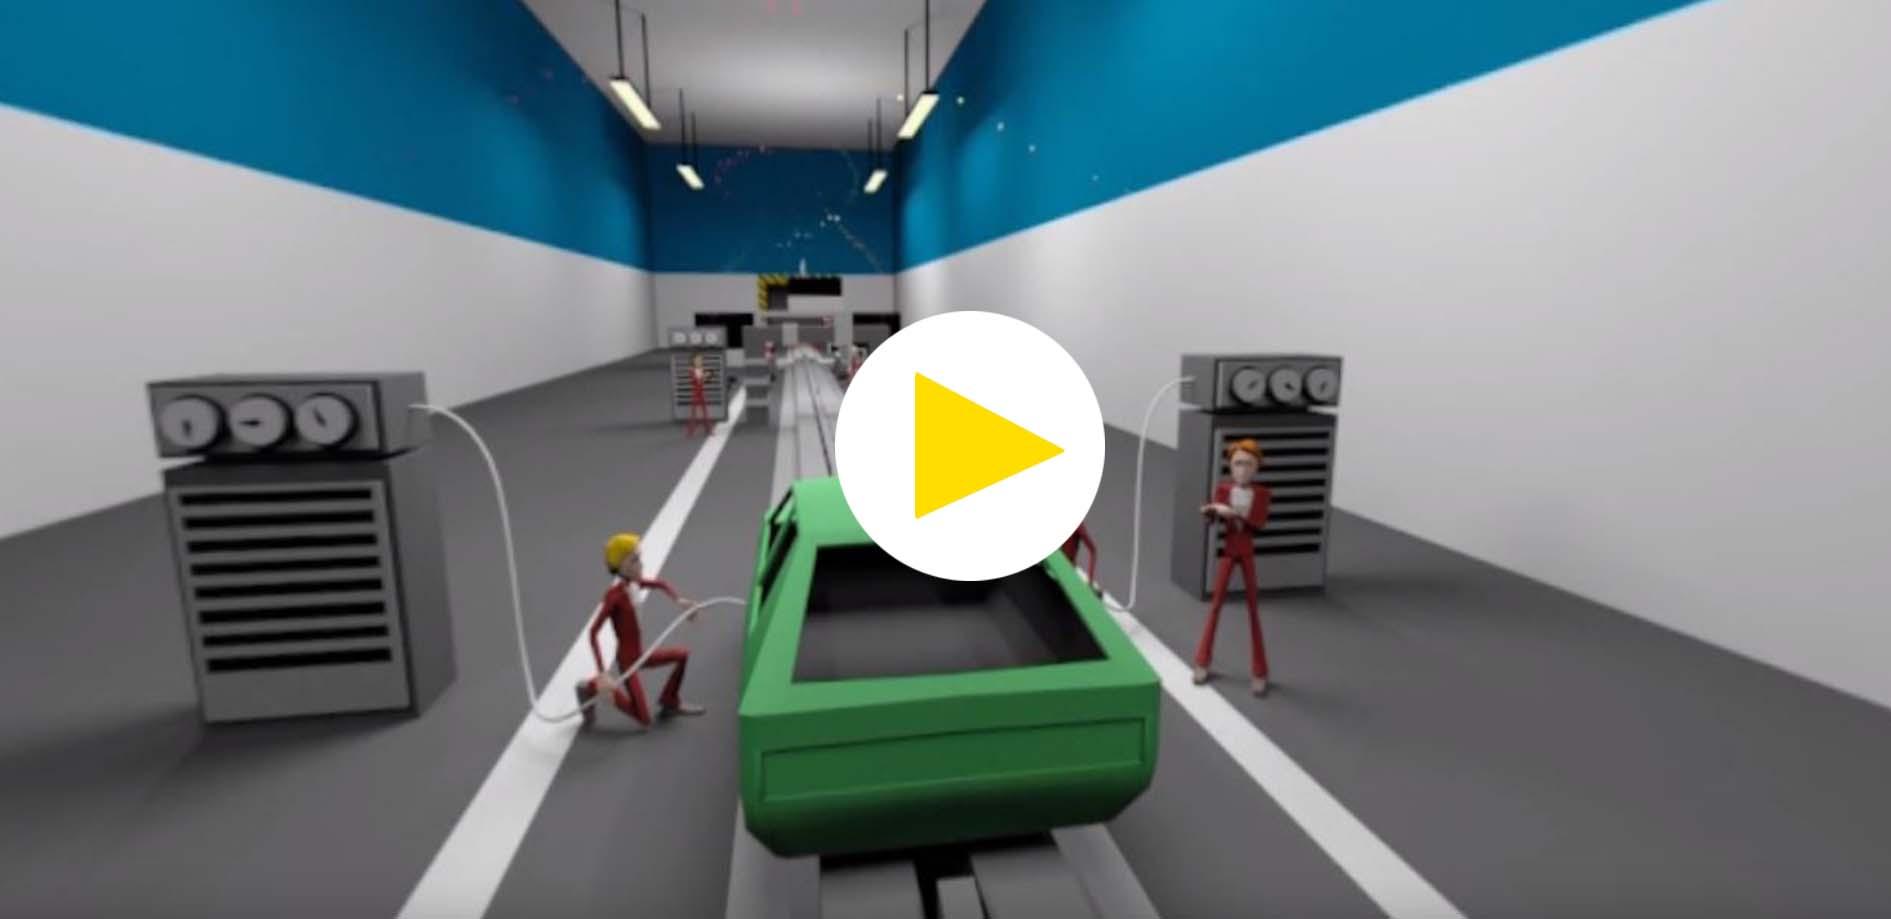 InfoGuard-Aruba-IoT-Video-Industrie-4.0.jpg